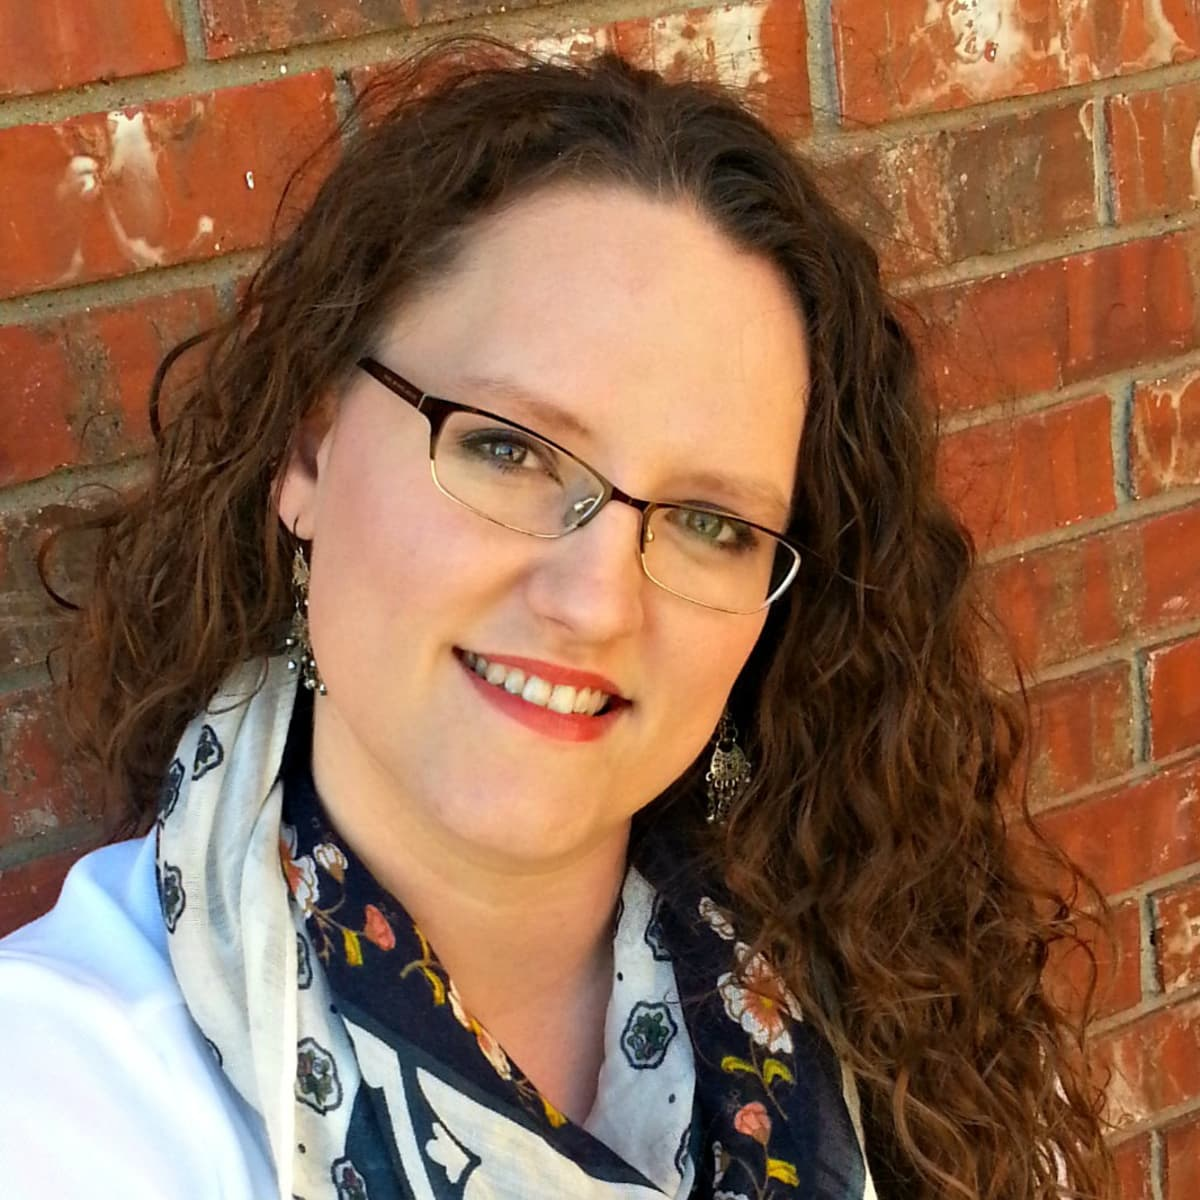 Megan Winkler: